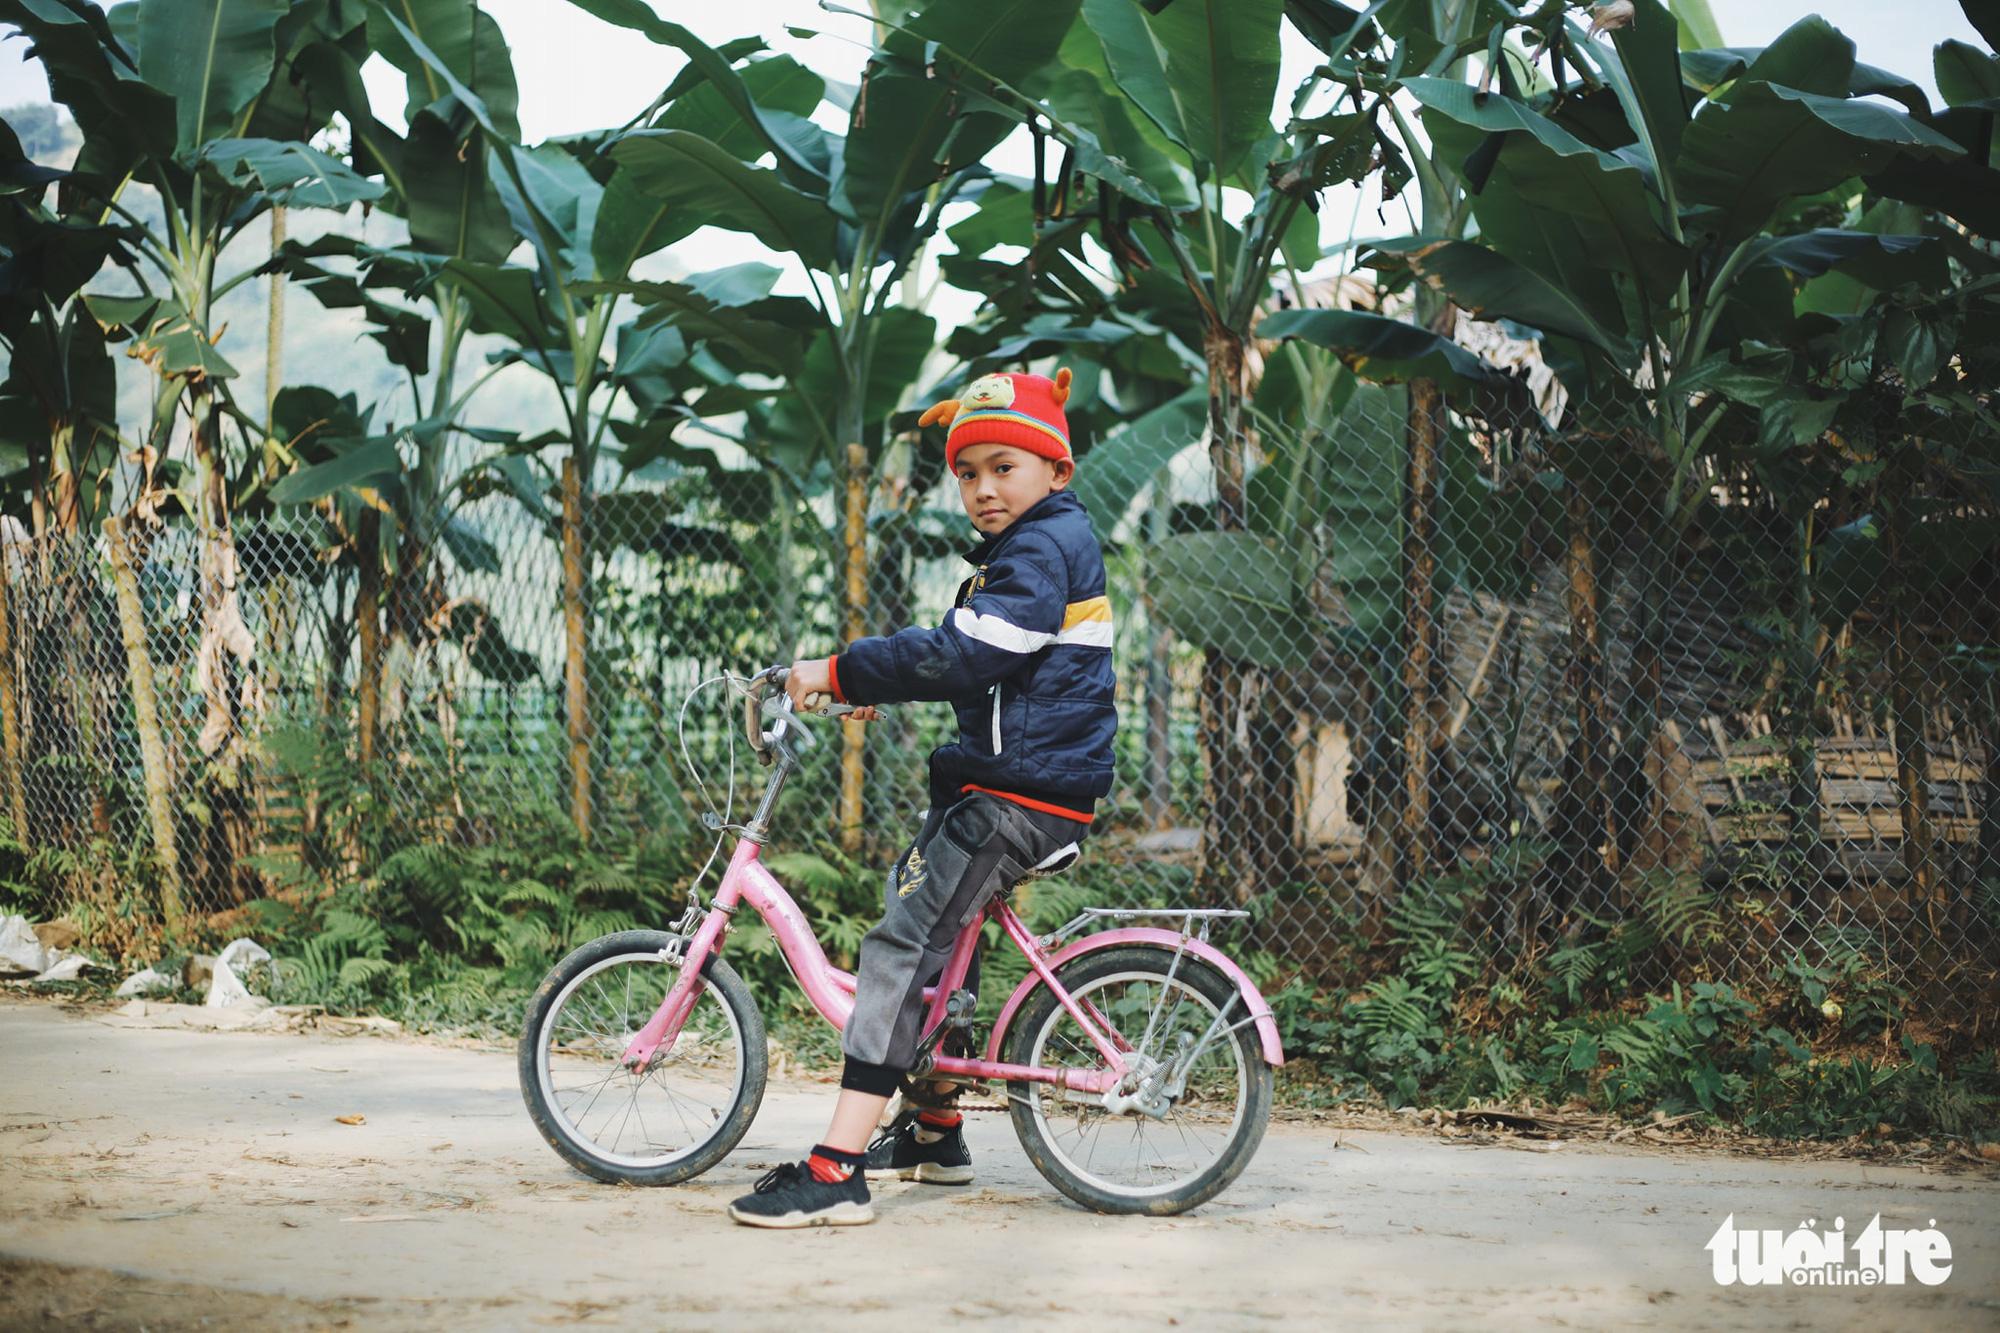 A local kid rides a bike around Tong Pang Village, Lam Thuong Commune, Luc Yen District, Yen Bai Province, Vietnam. Photo: Mai Thuong / Tuoi Tre